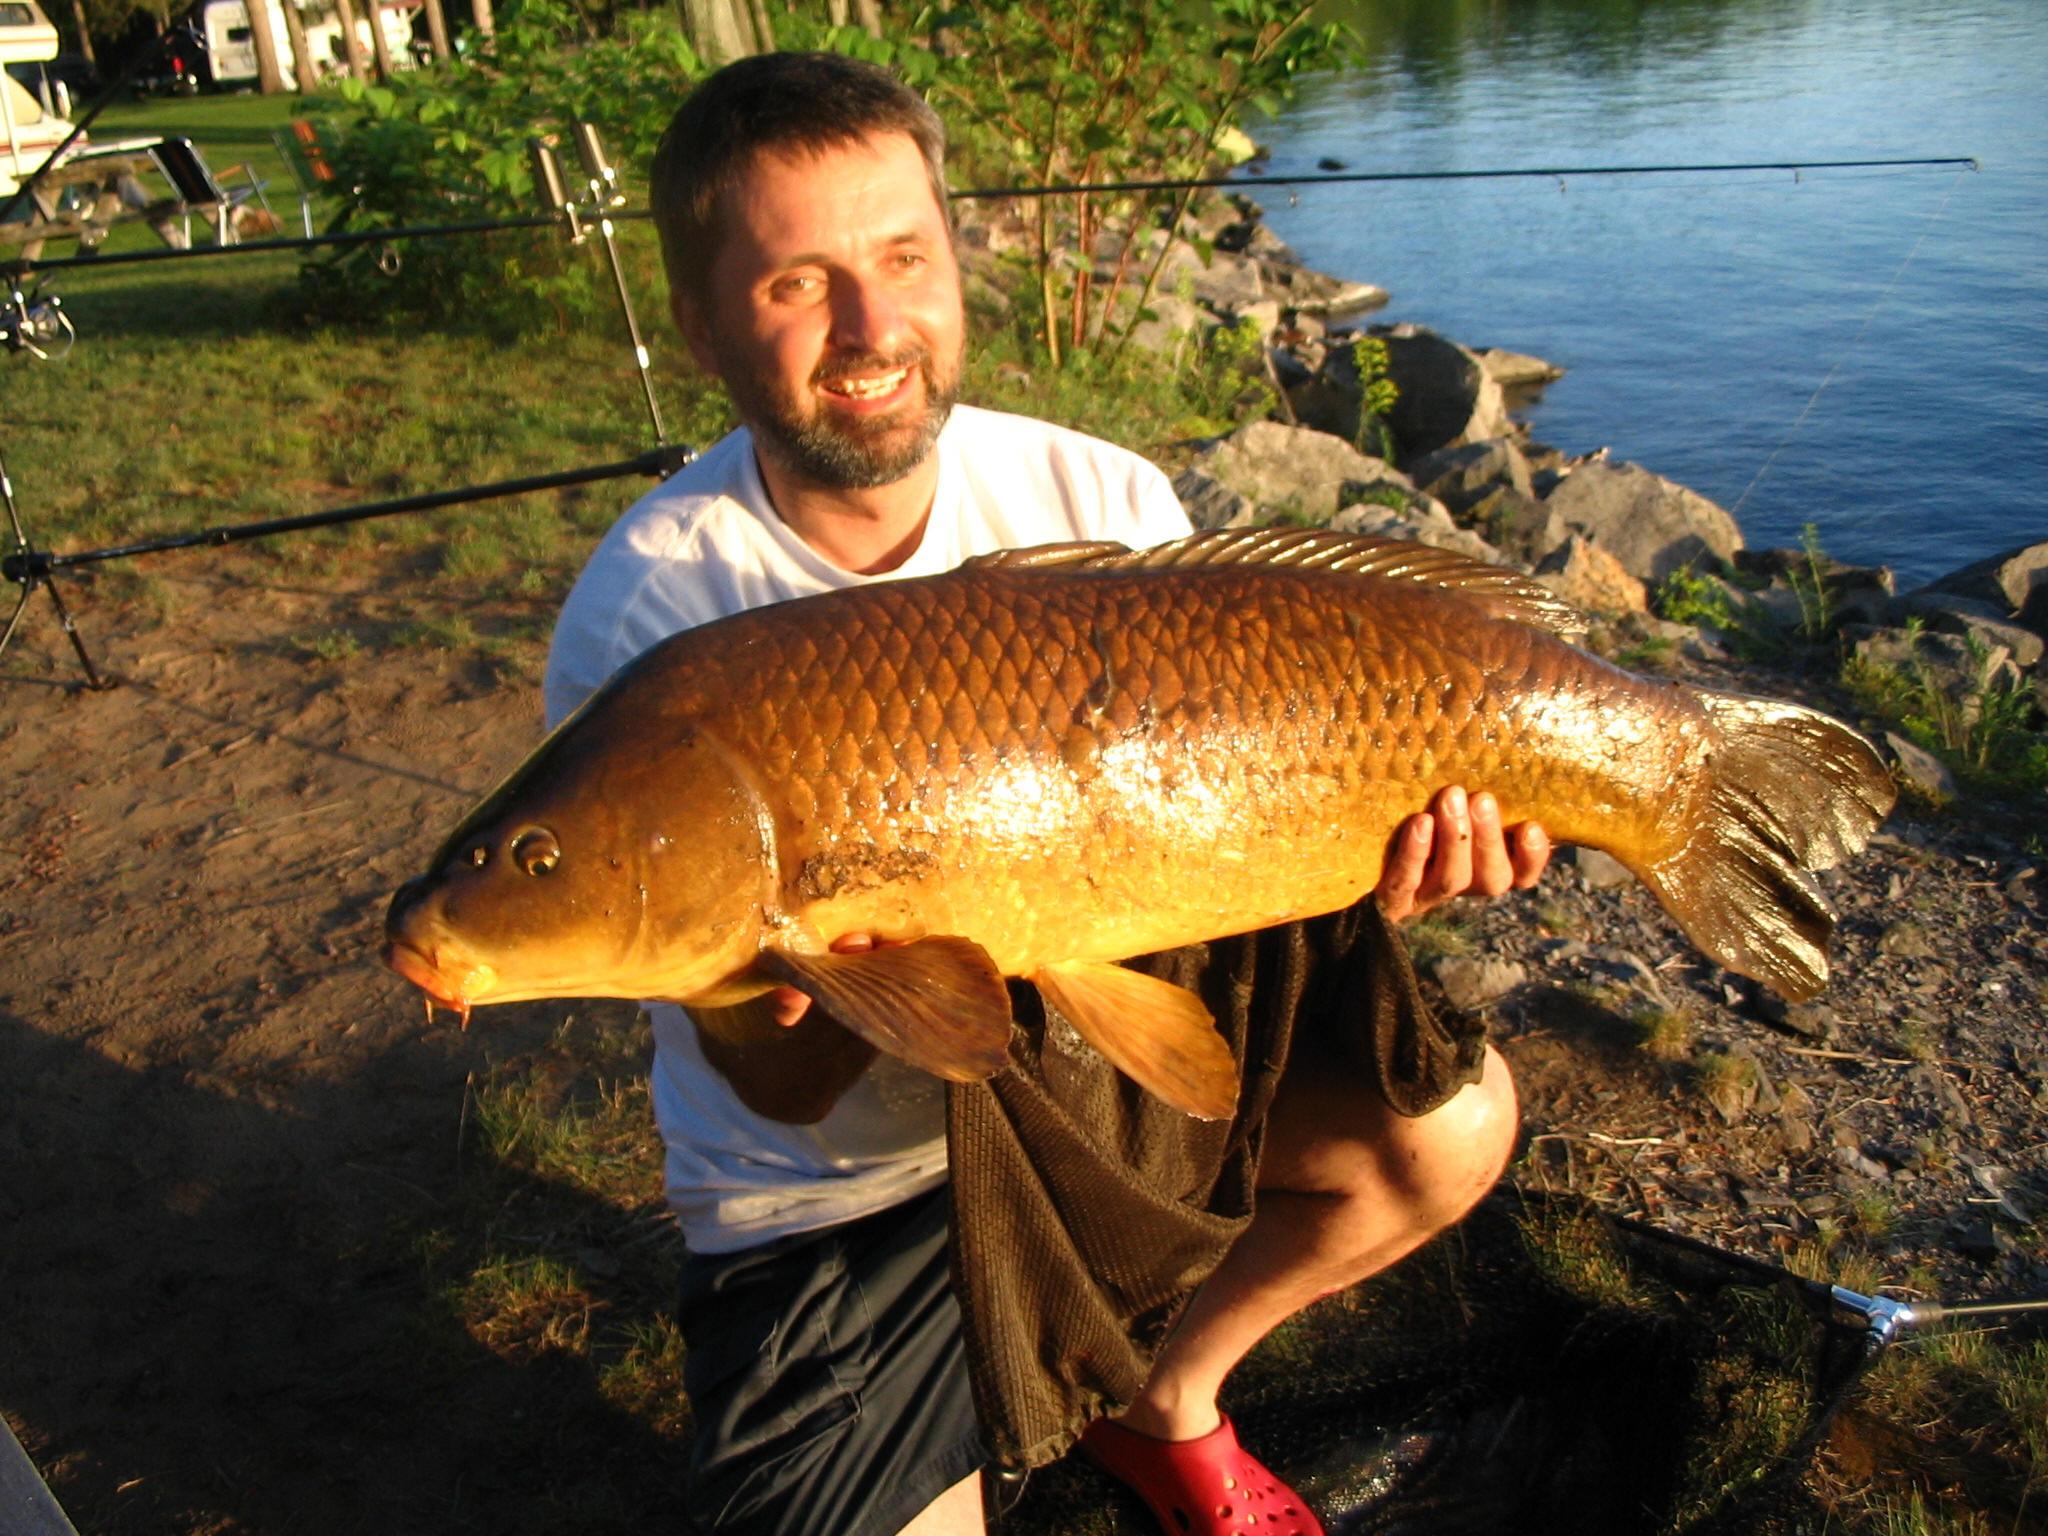 Ontario carp fishing how to fish for carp in ontario canada